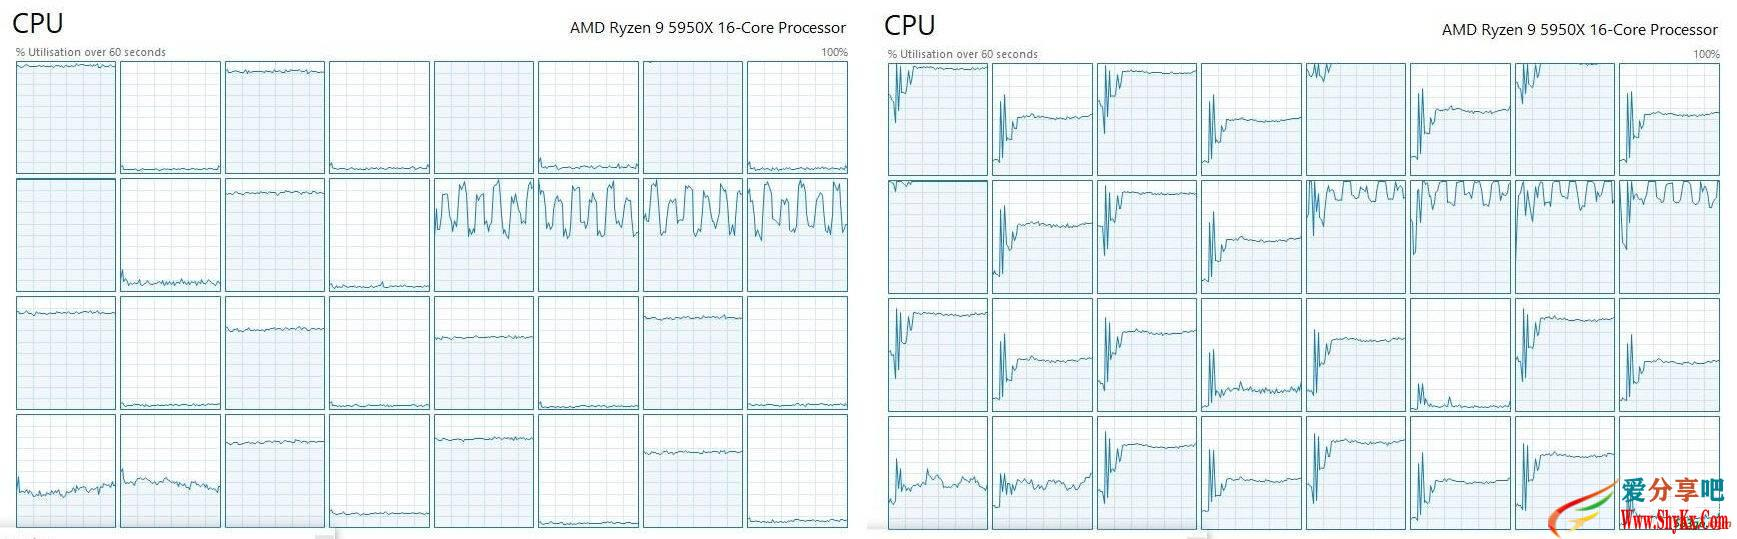 1.jpg 《赛博朋克2077》不支持AMD锐龙多线程:原因找到了 游戏问题